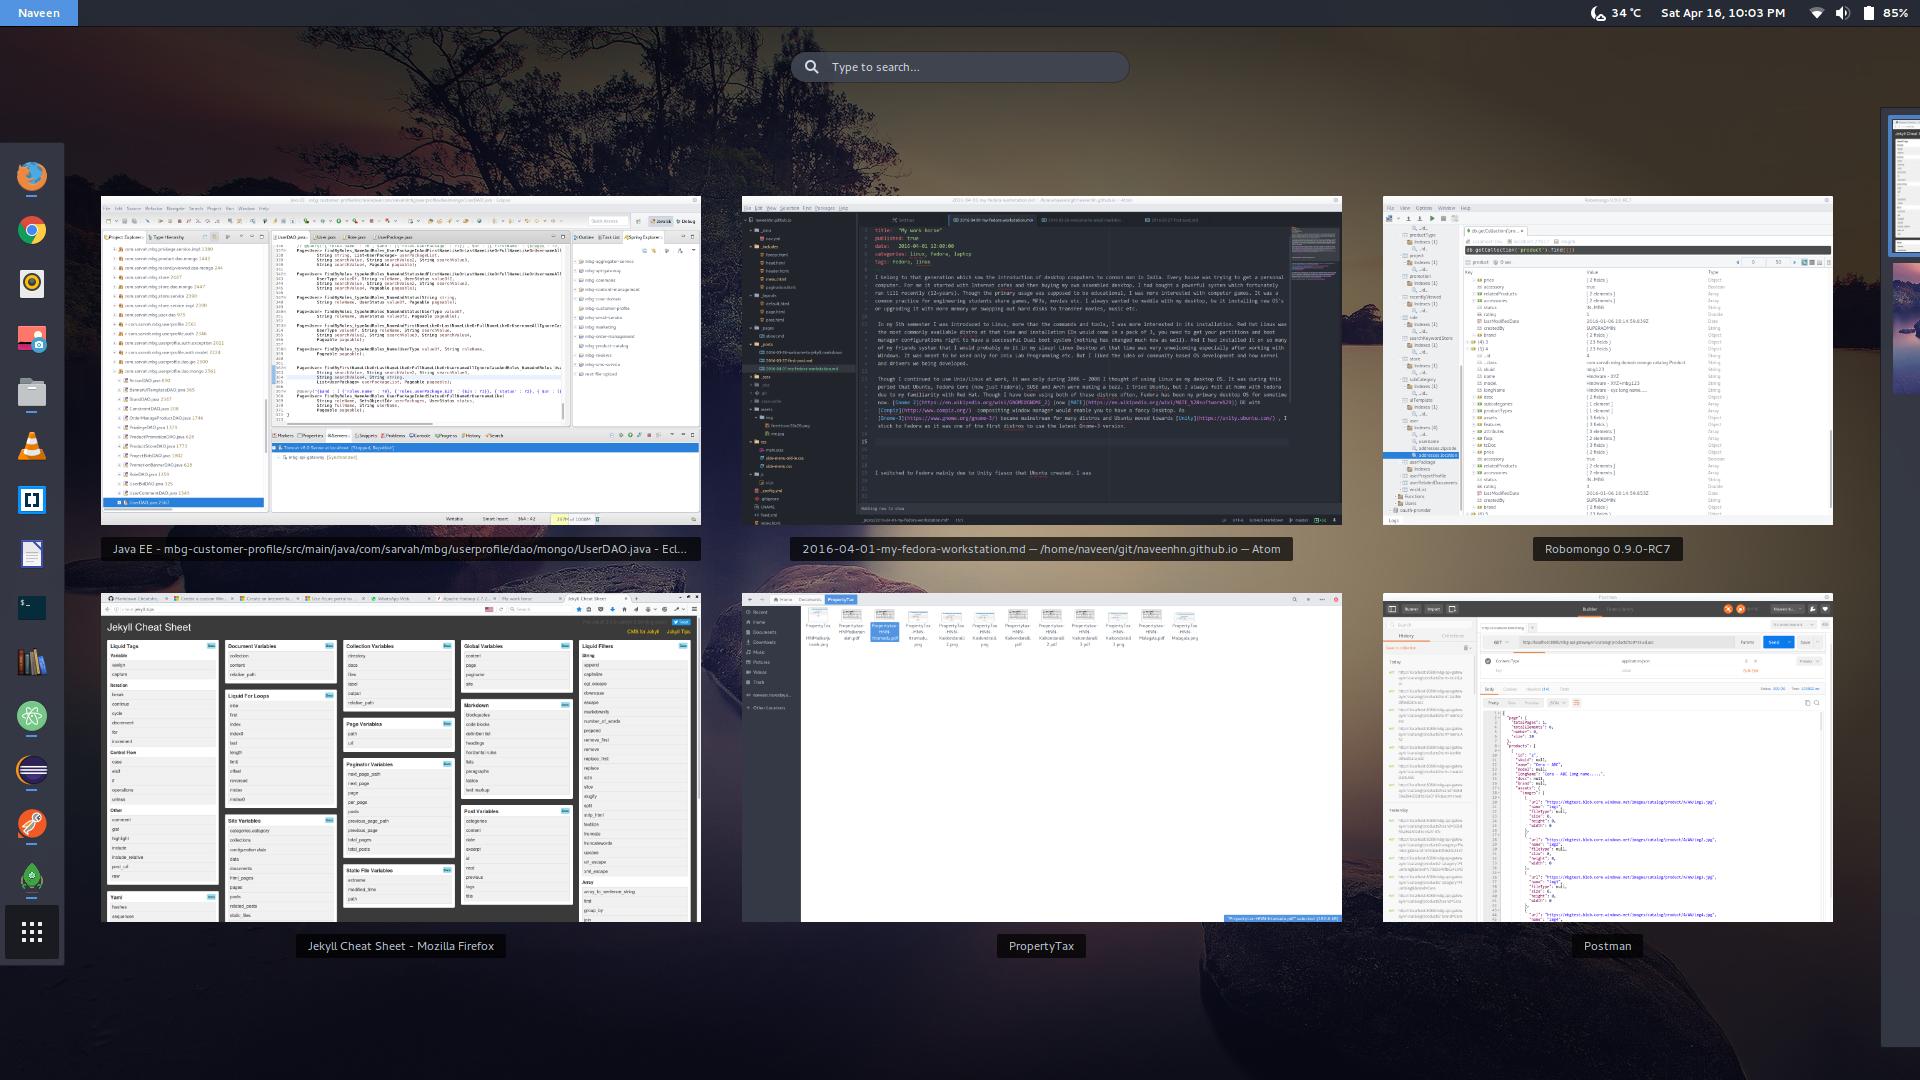 windowsandapps